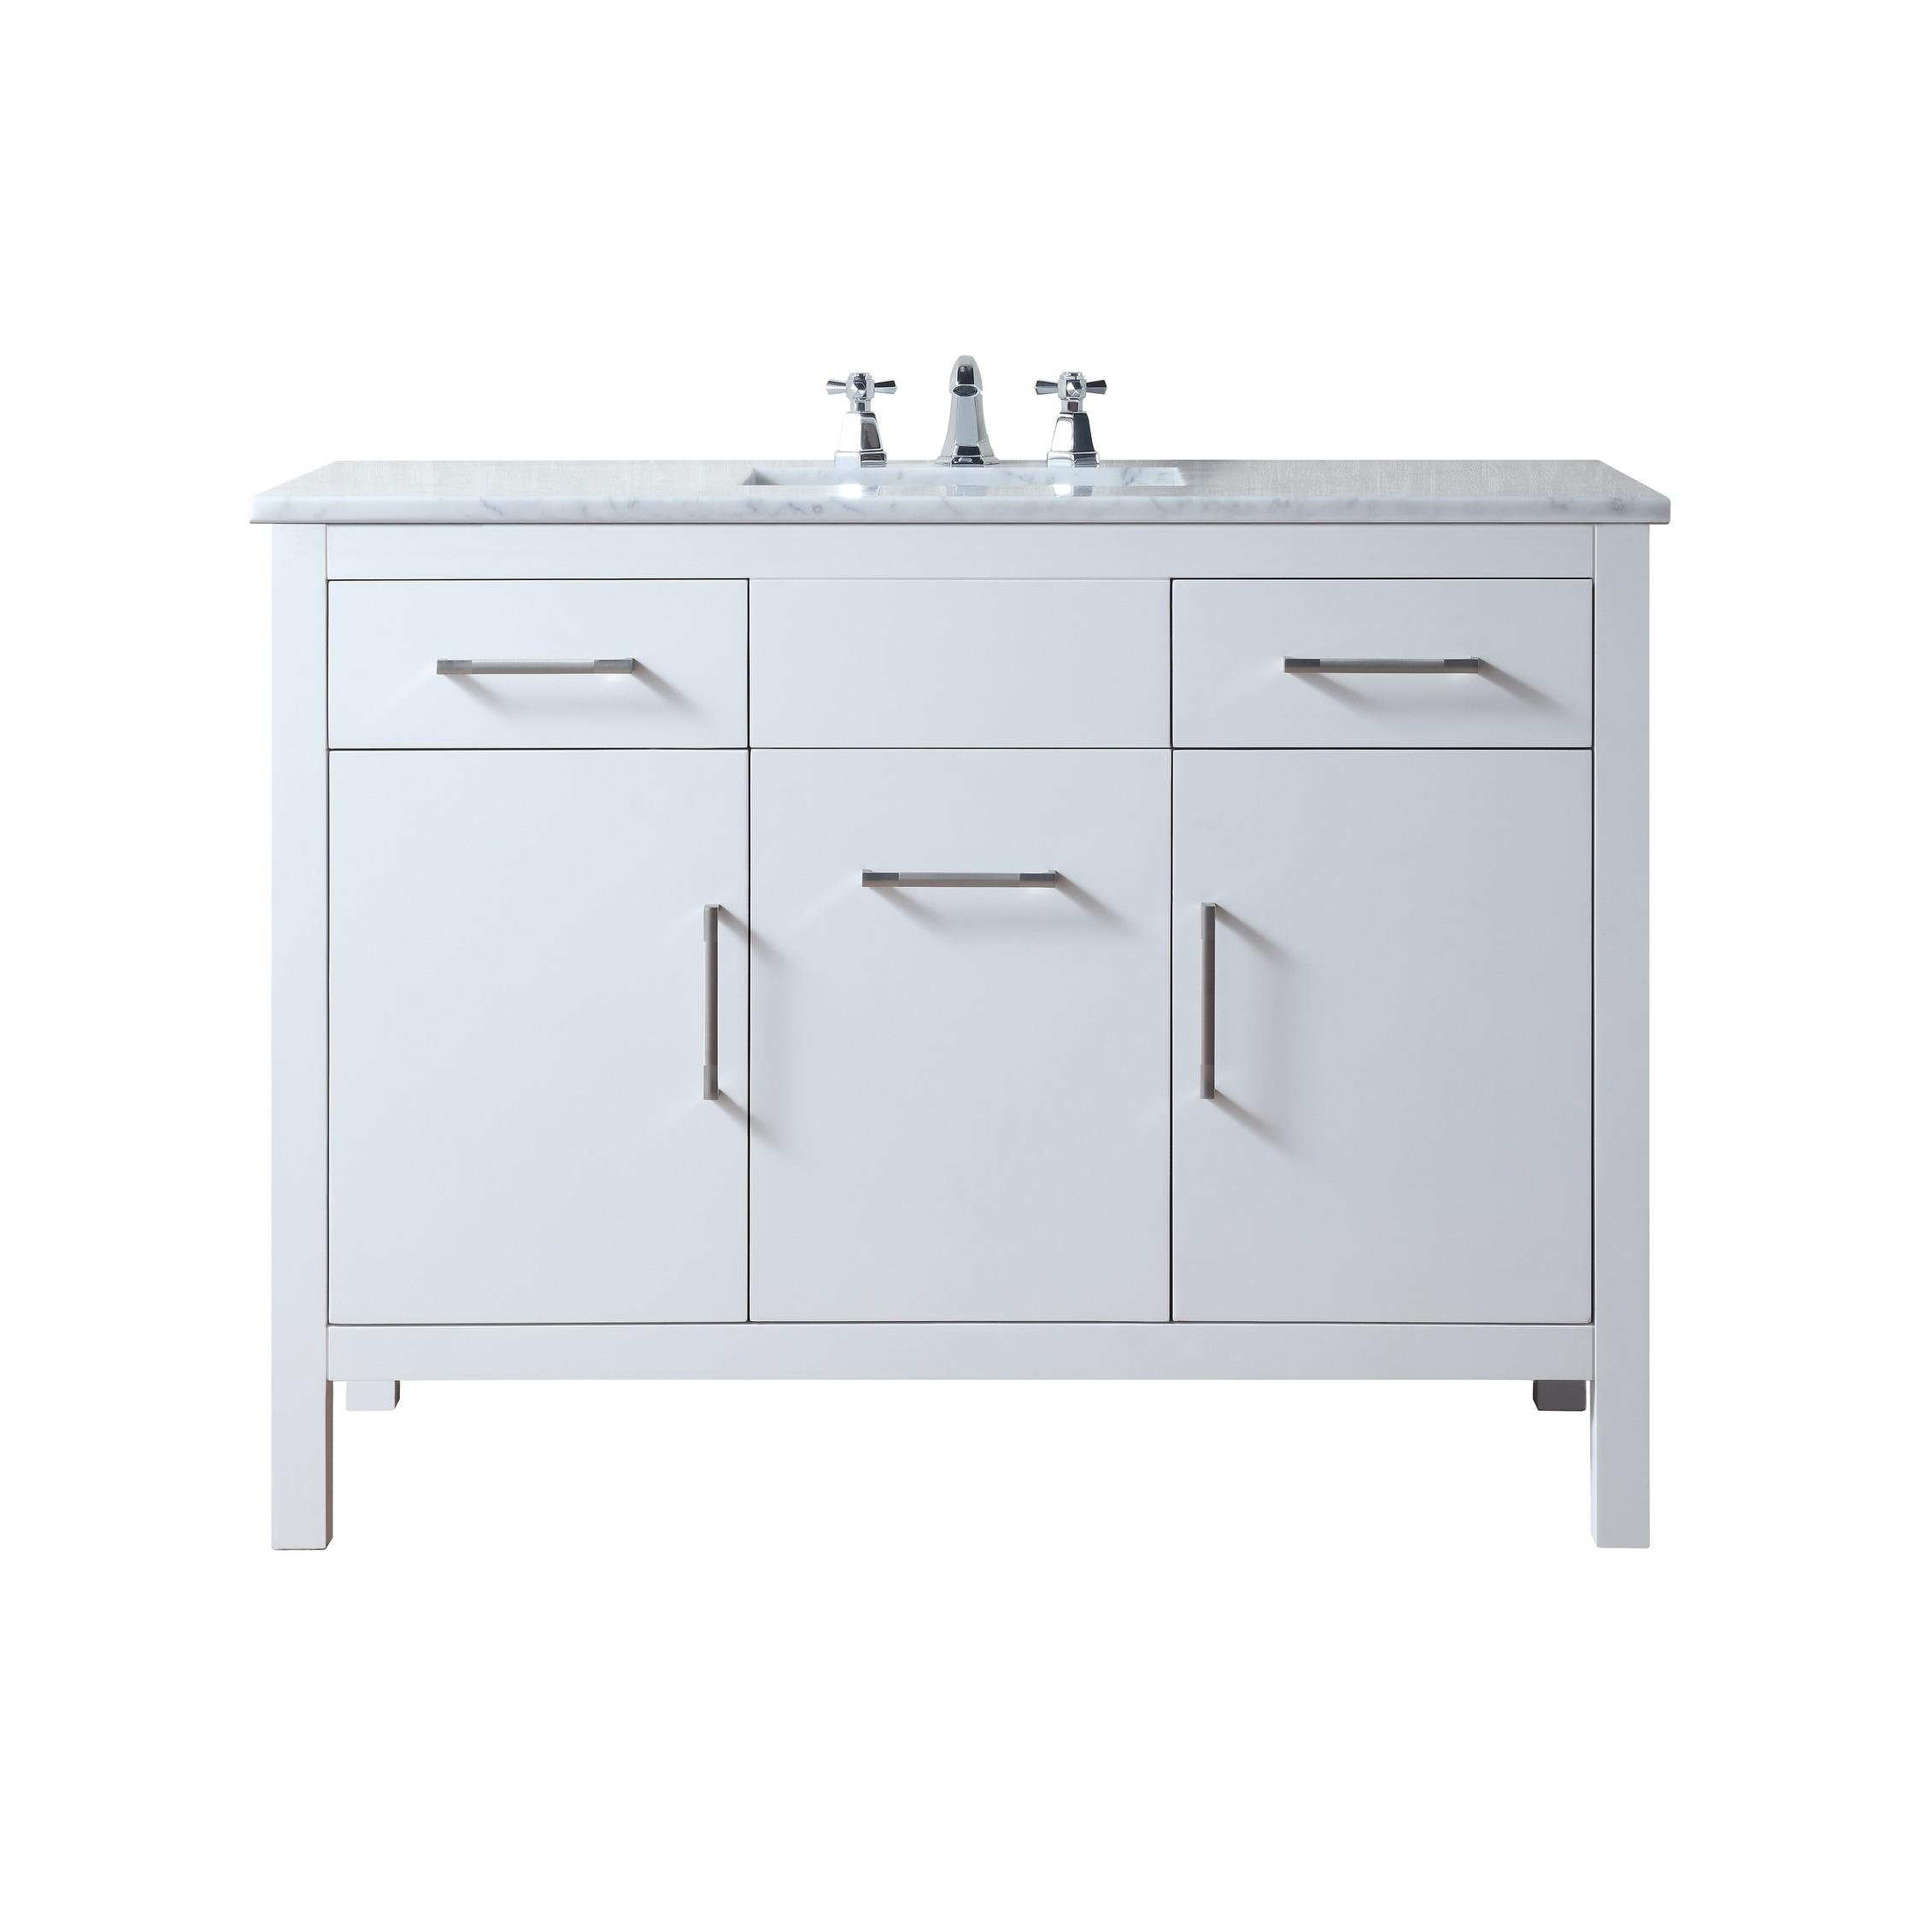 Stufurhome Atreus 48 Inch White Single Sink Bathroom Vanity With Carrara Marble Top Overstock 22288566